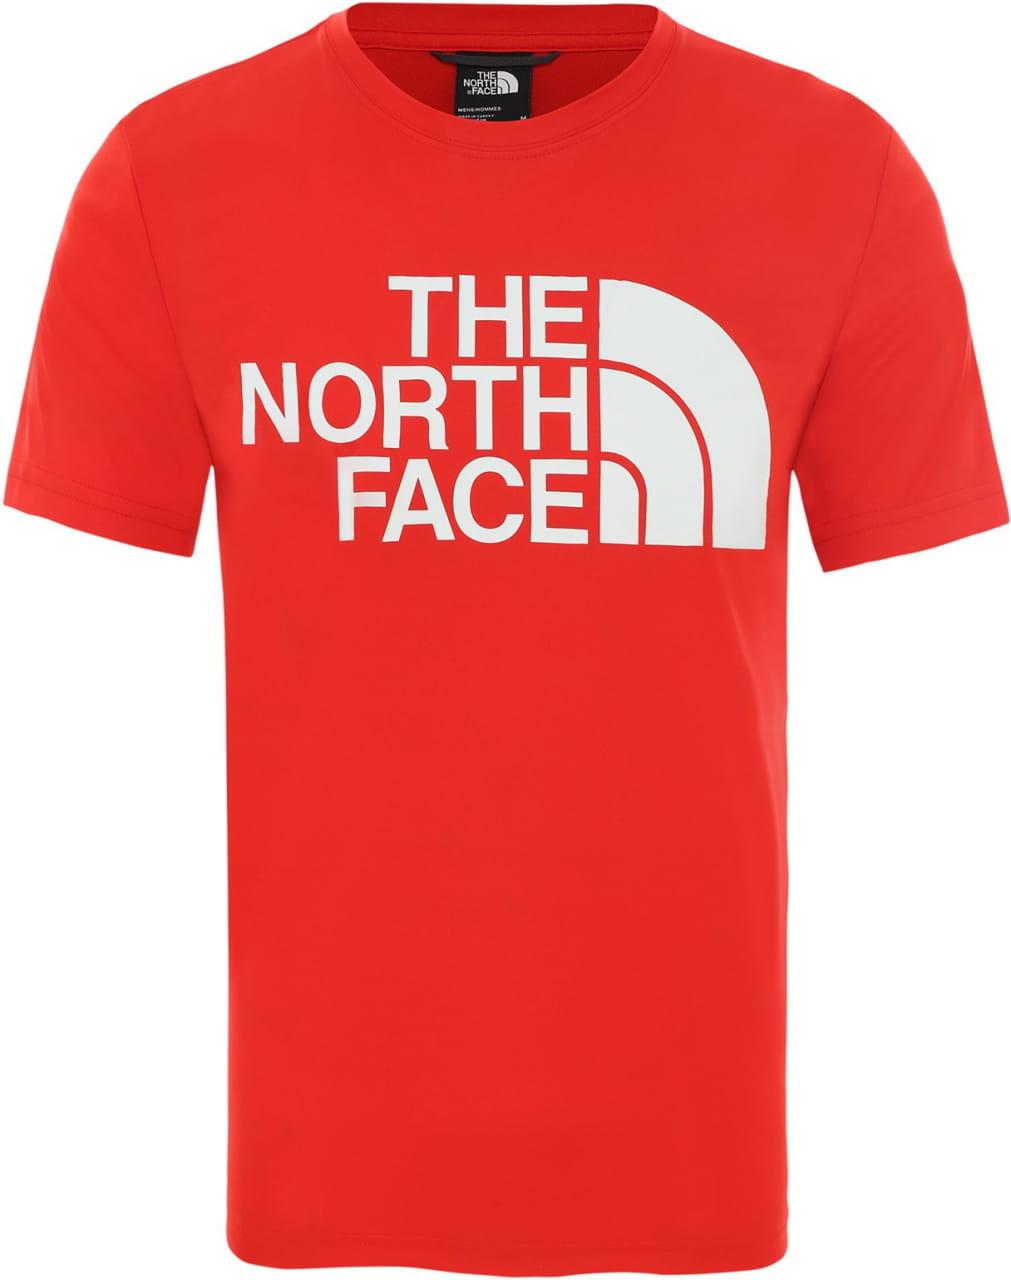 Pánské tričko The North Face Men's Reaxion Easy T-Shirt